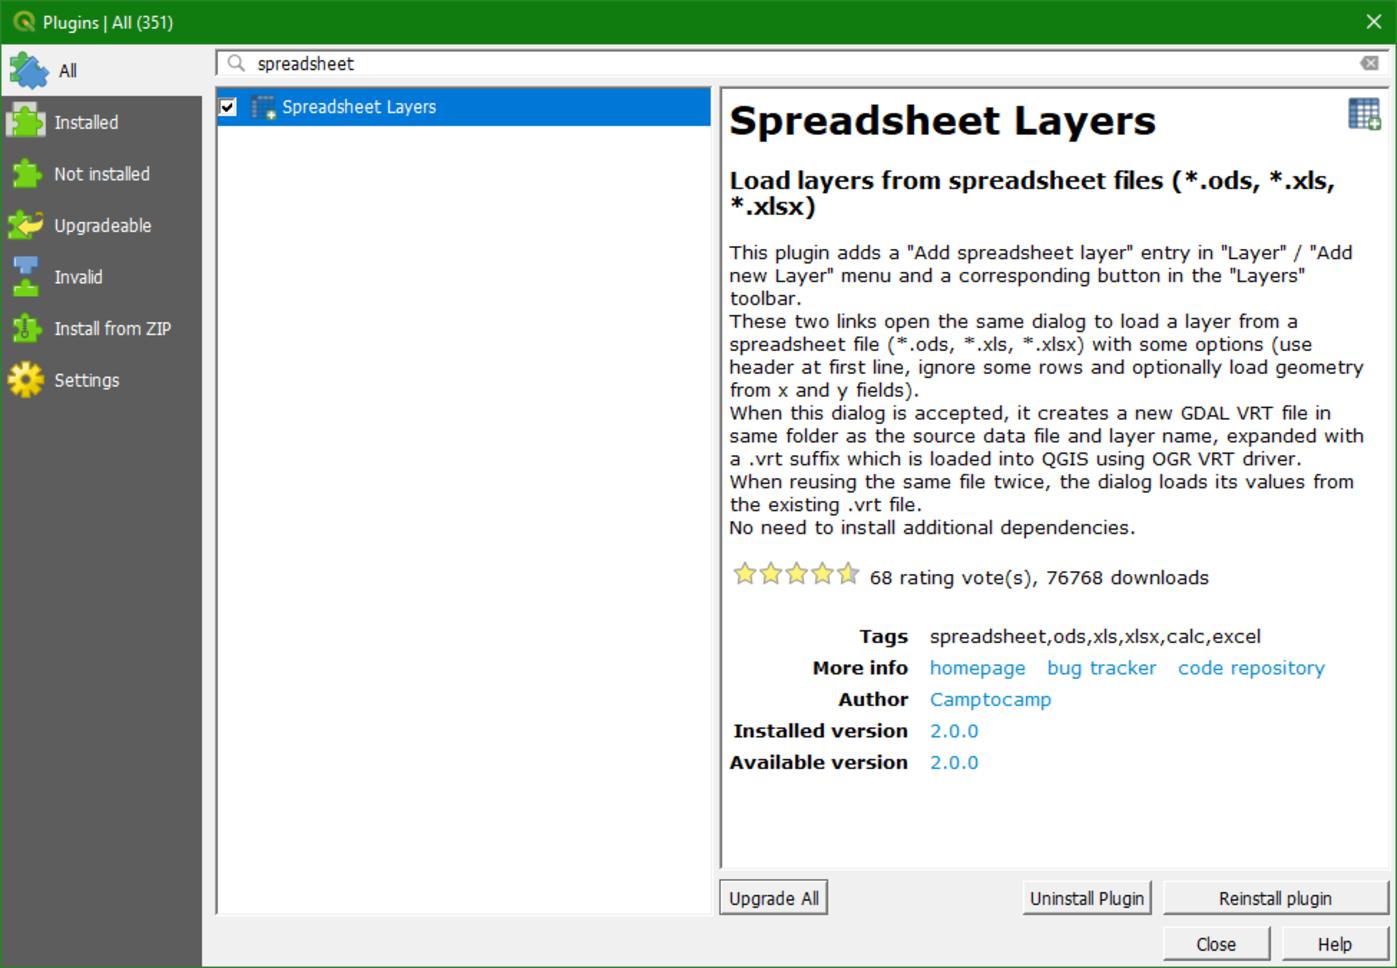 Spreadsheet Layers plugin